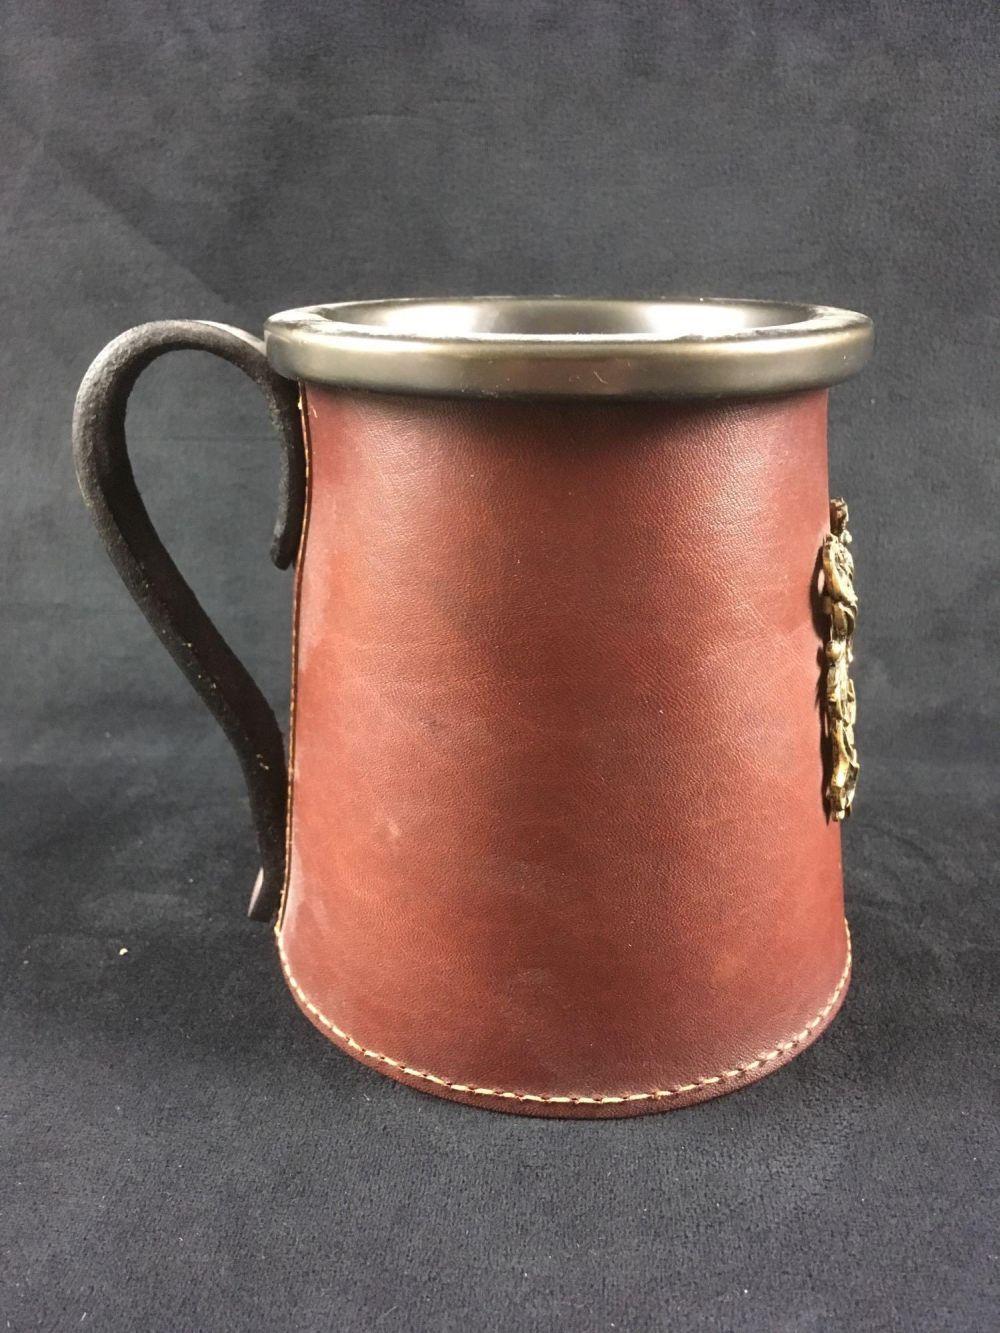 Lot 787: English Beer Mug with Leather Sleeve